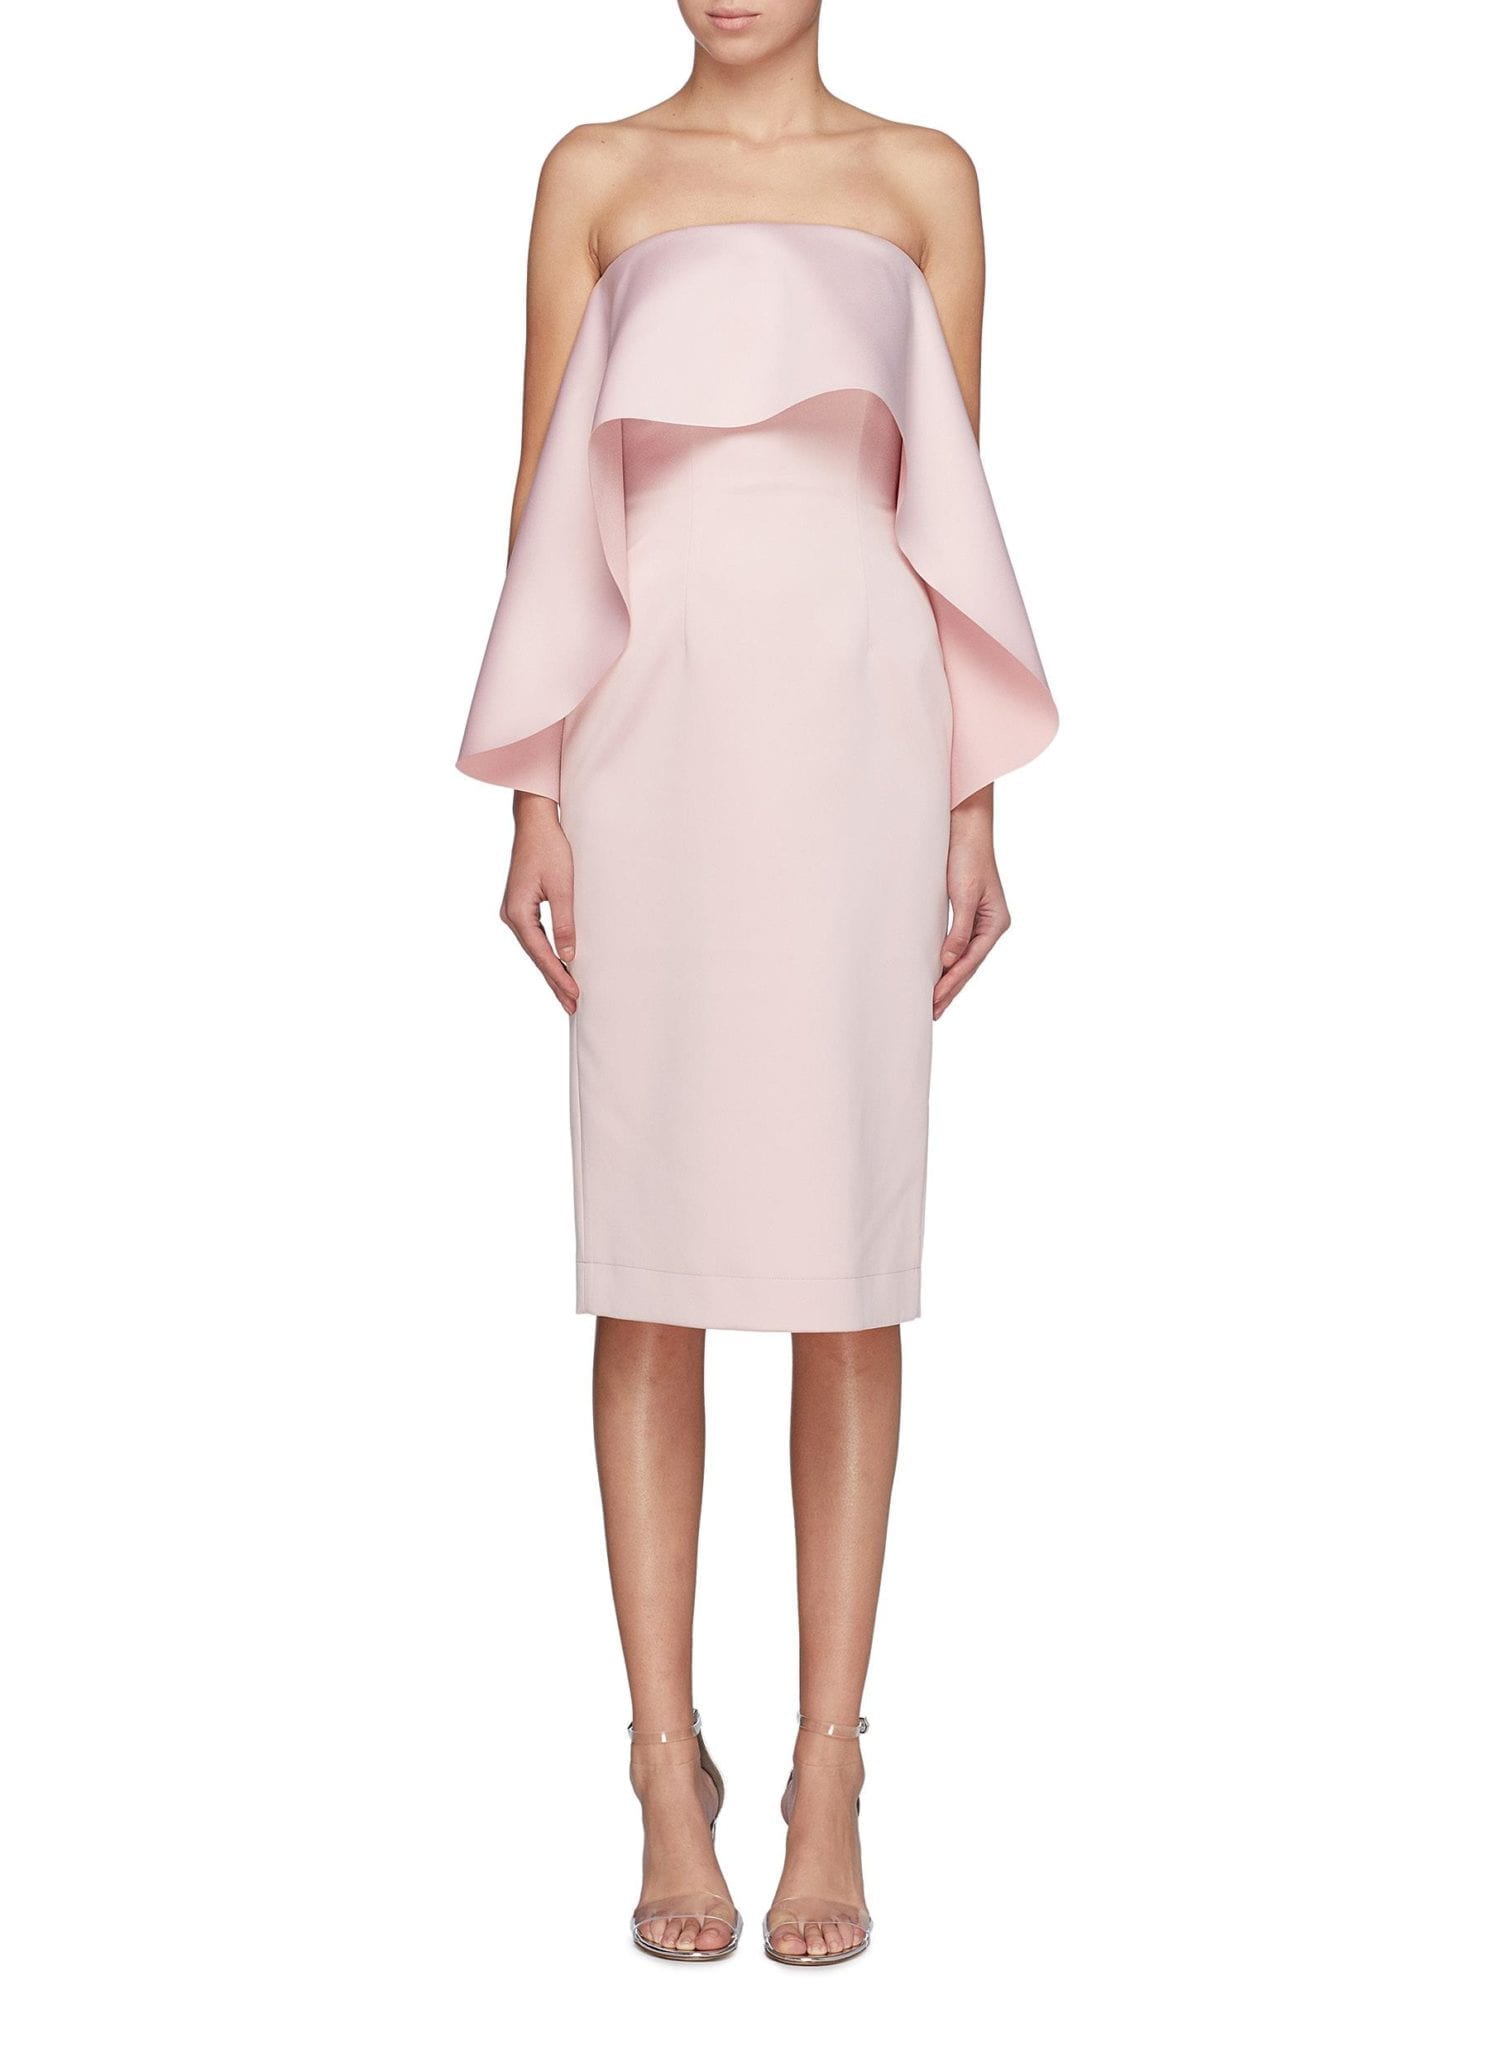 SOLACE LONDON 'Coleta' Ruffle Drape Strapless Pink Dress